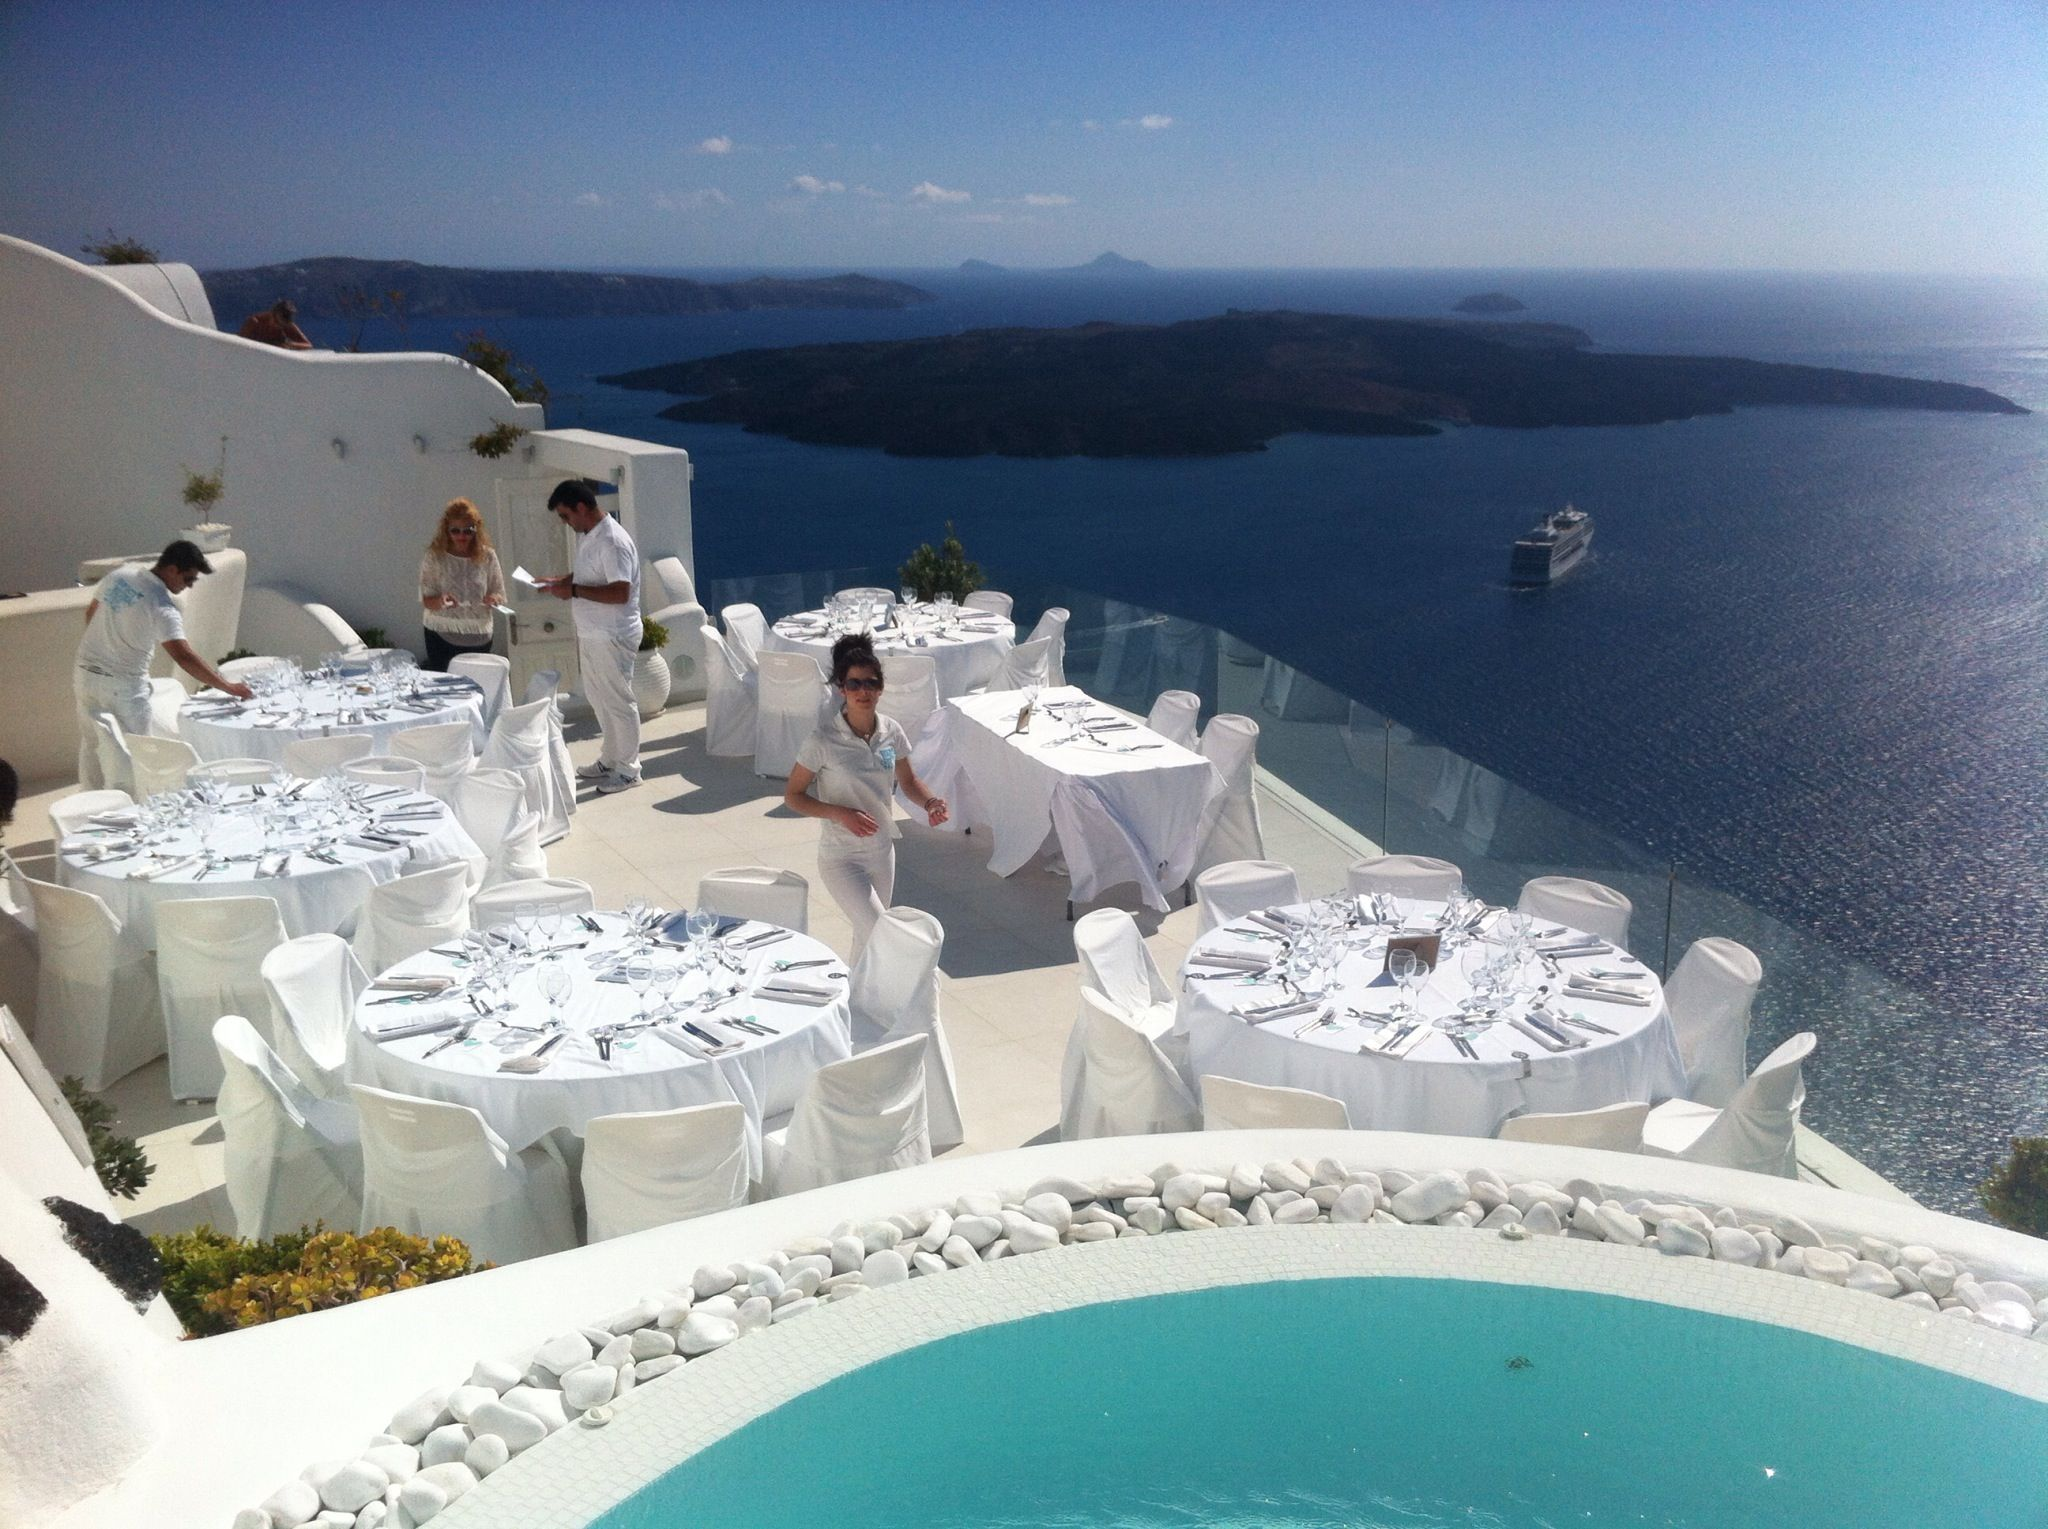 Greece Channel Santorini Dana Villas Http Www Romance Weddings In Pinterest Wedding And Private